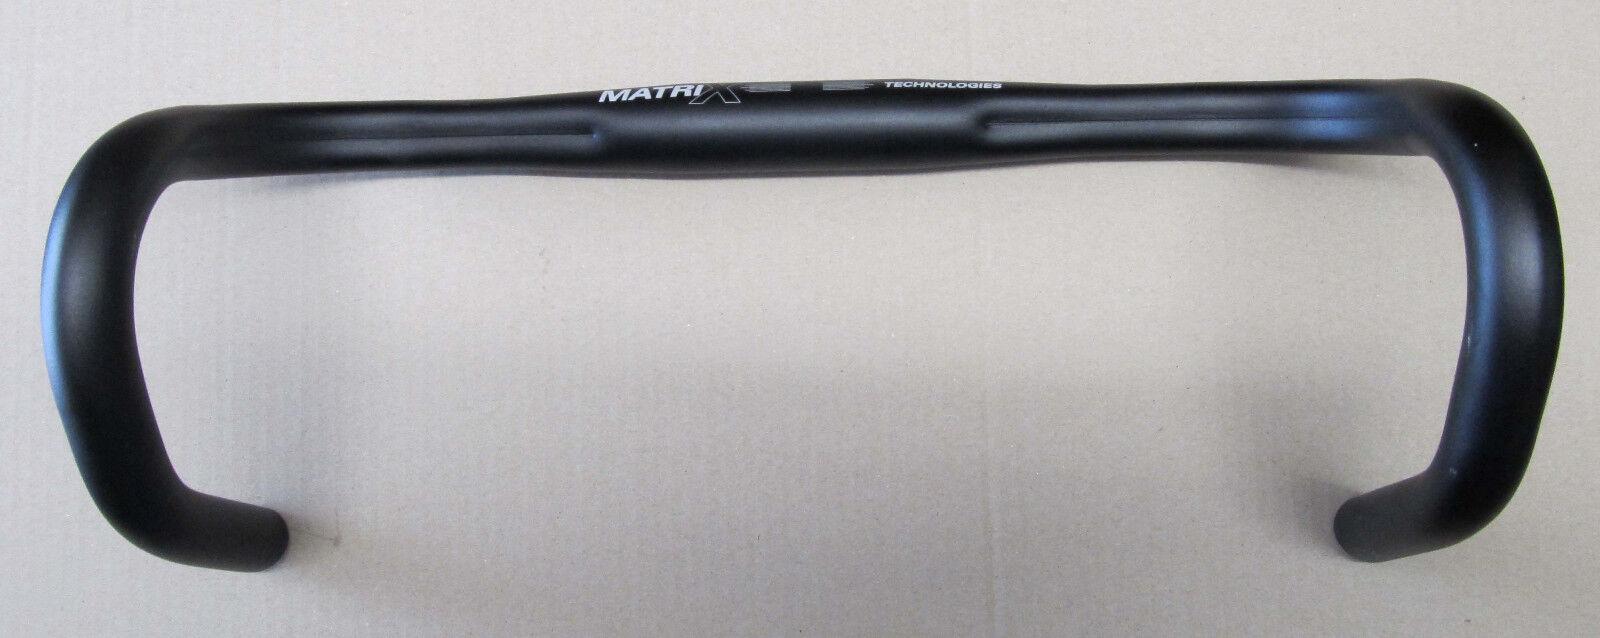 Matrix Kalloy AL049L Alu Rennrad Lenker 40cm black 31,8mm 400gramm NEU